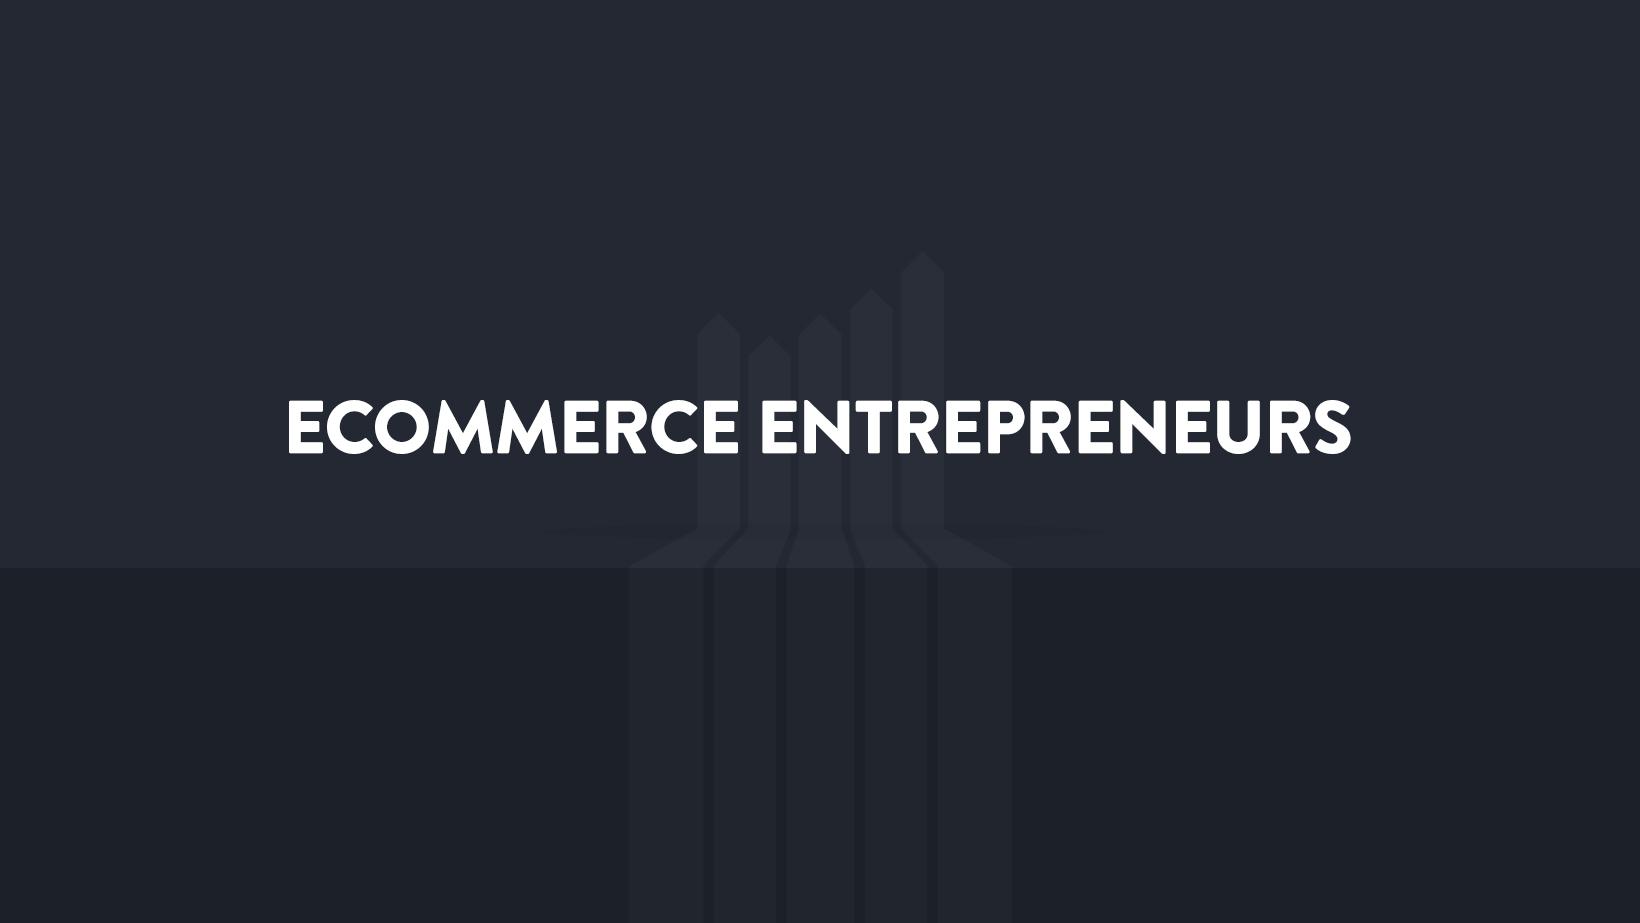 Ecommerce Entrepreneurs- eCommerce Facebook Groups 2021